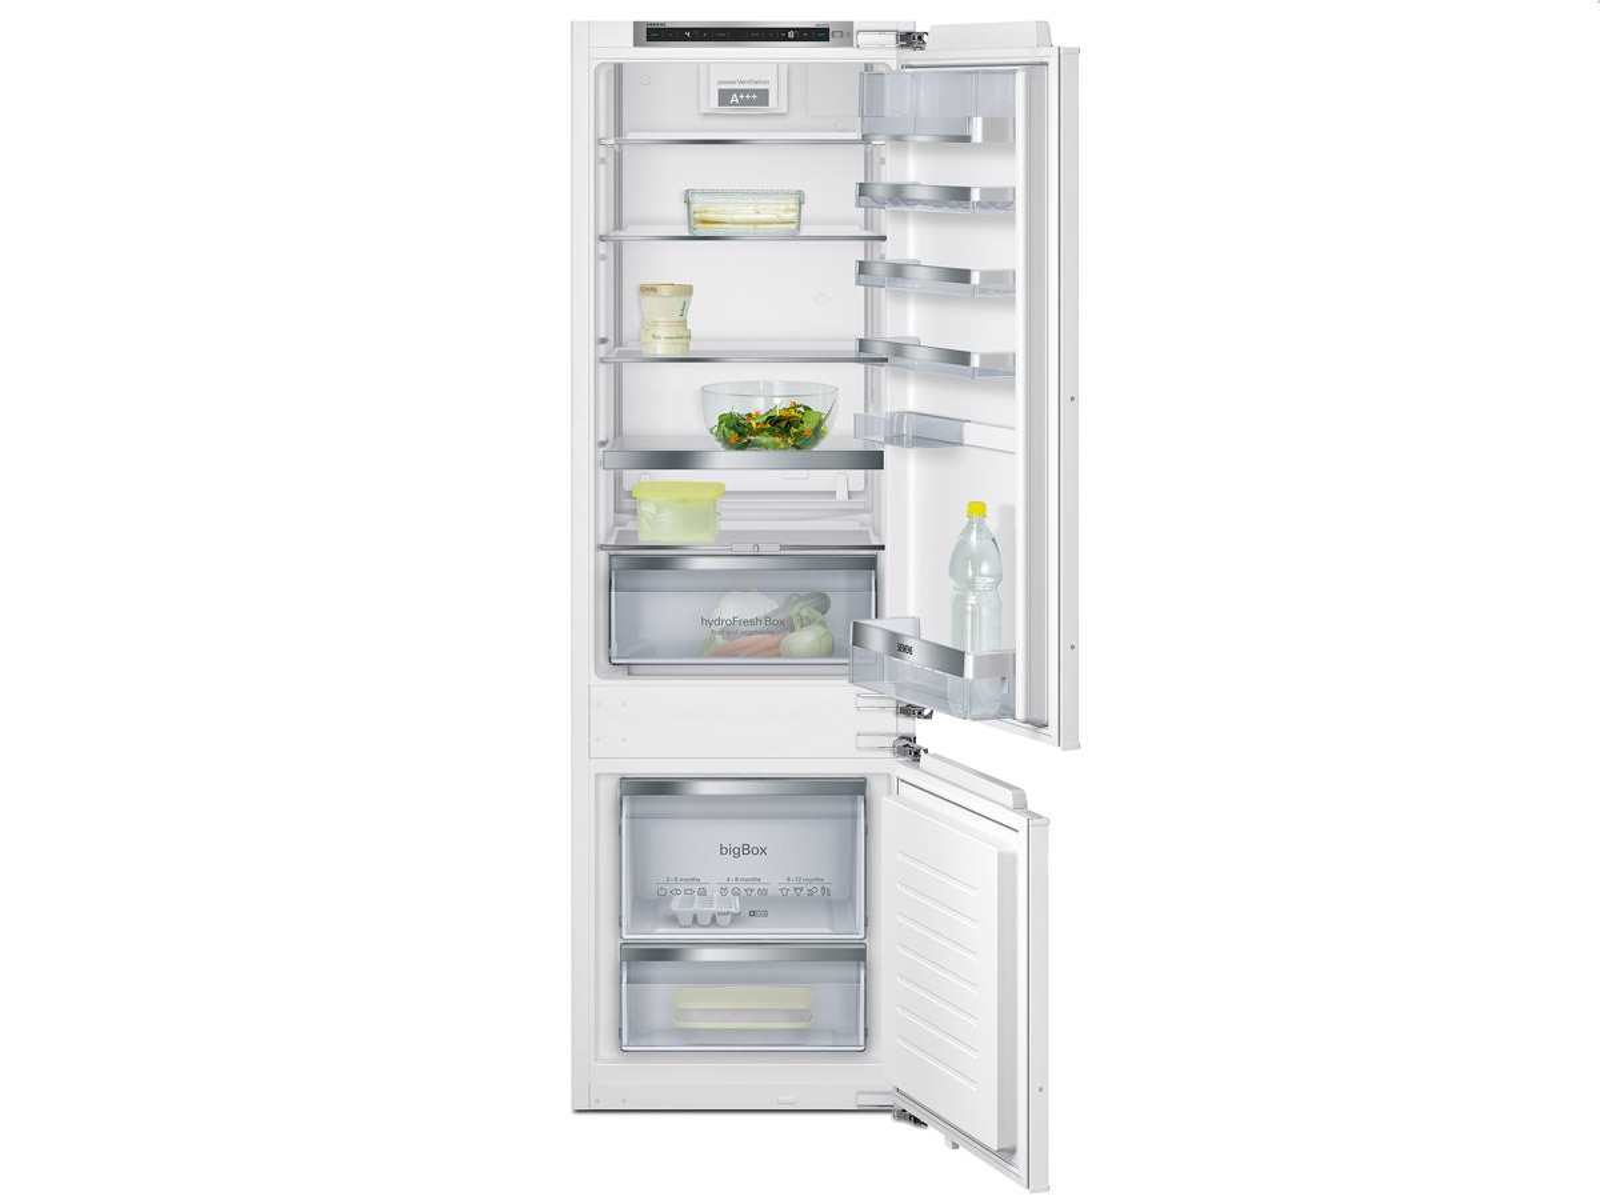 Kühlschrank Kombi : Siemens kühl gefrierkombi kg vul kühlschrank modelle